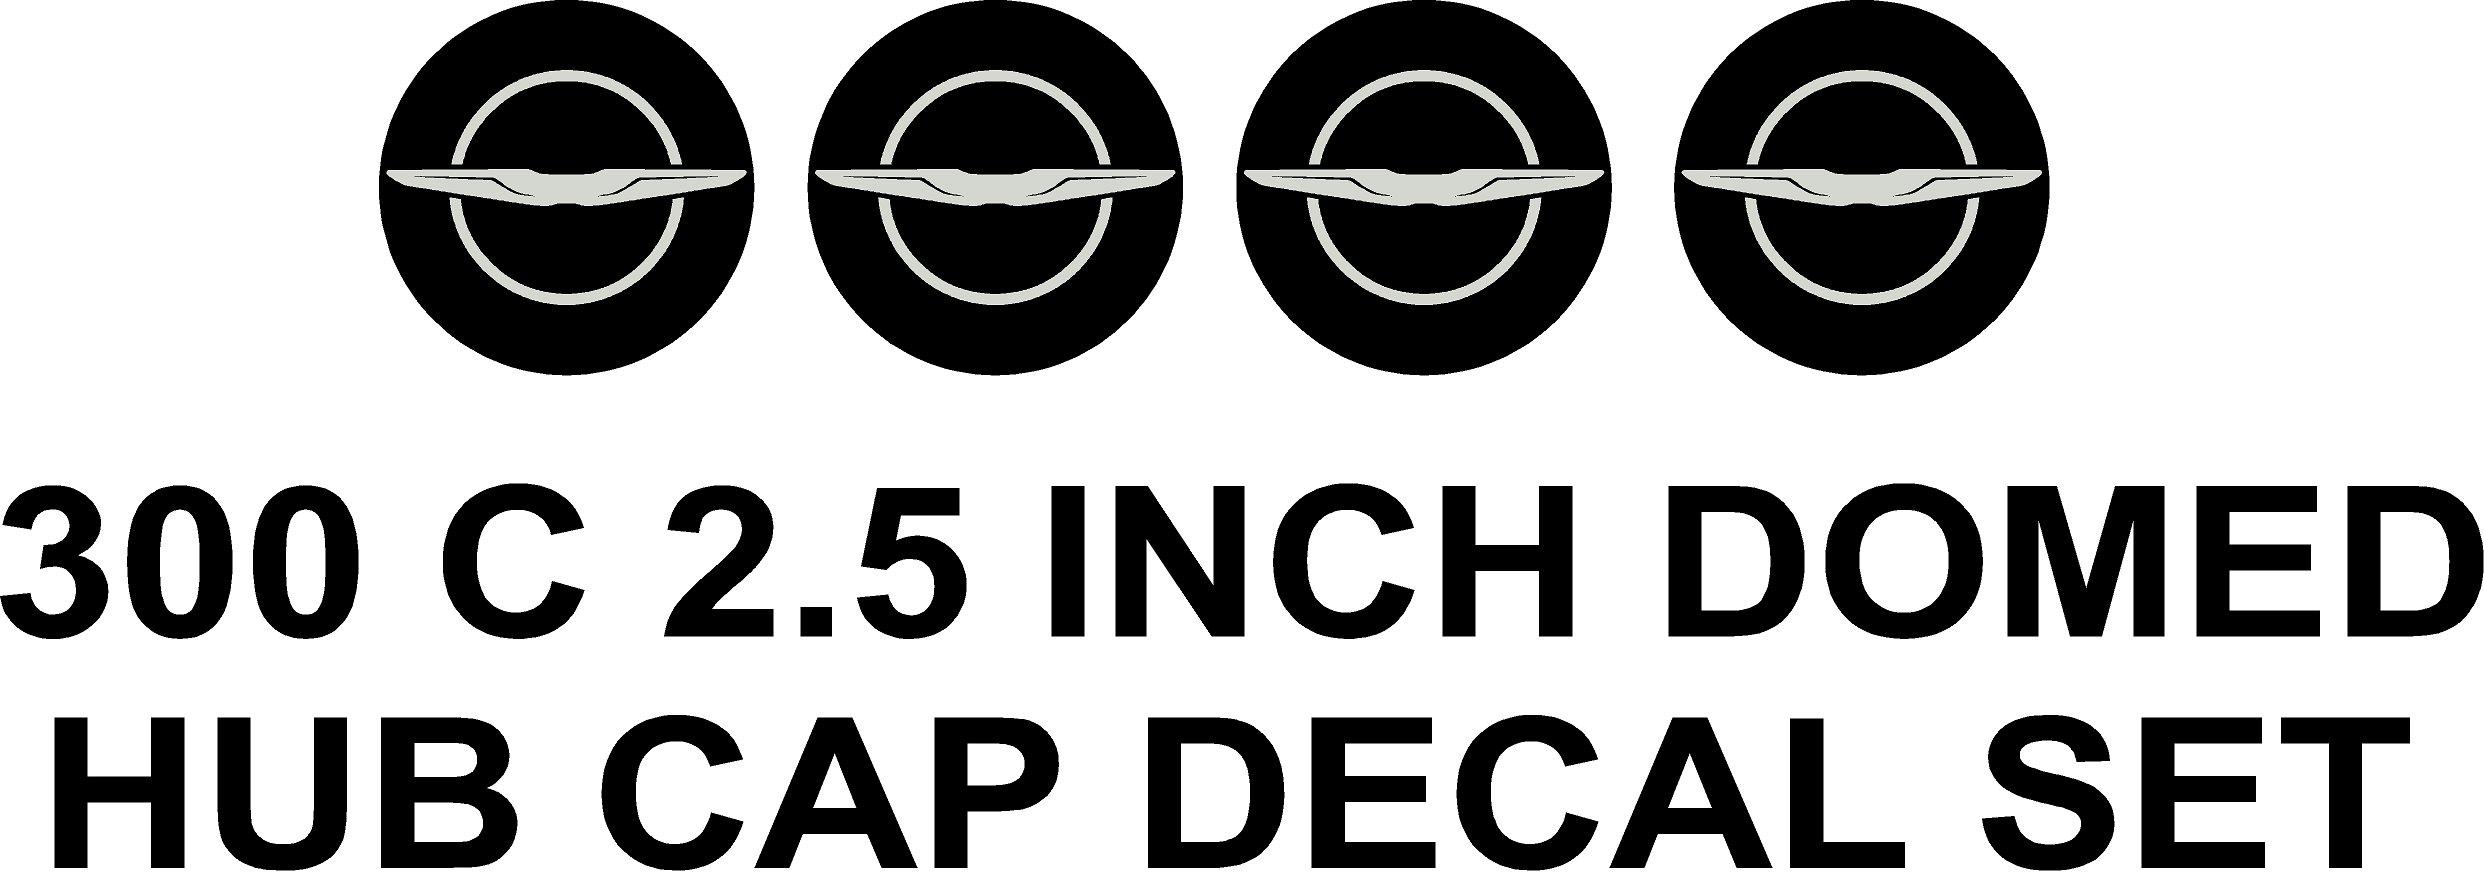 300 C 2.5 Custom Domed Hub Cap Decal Set